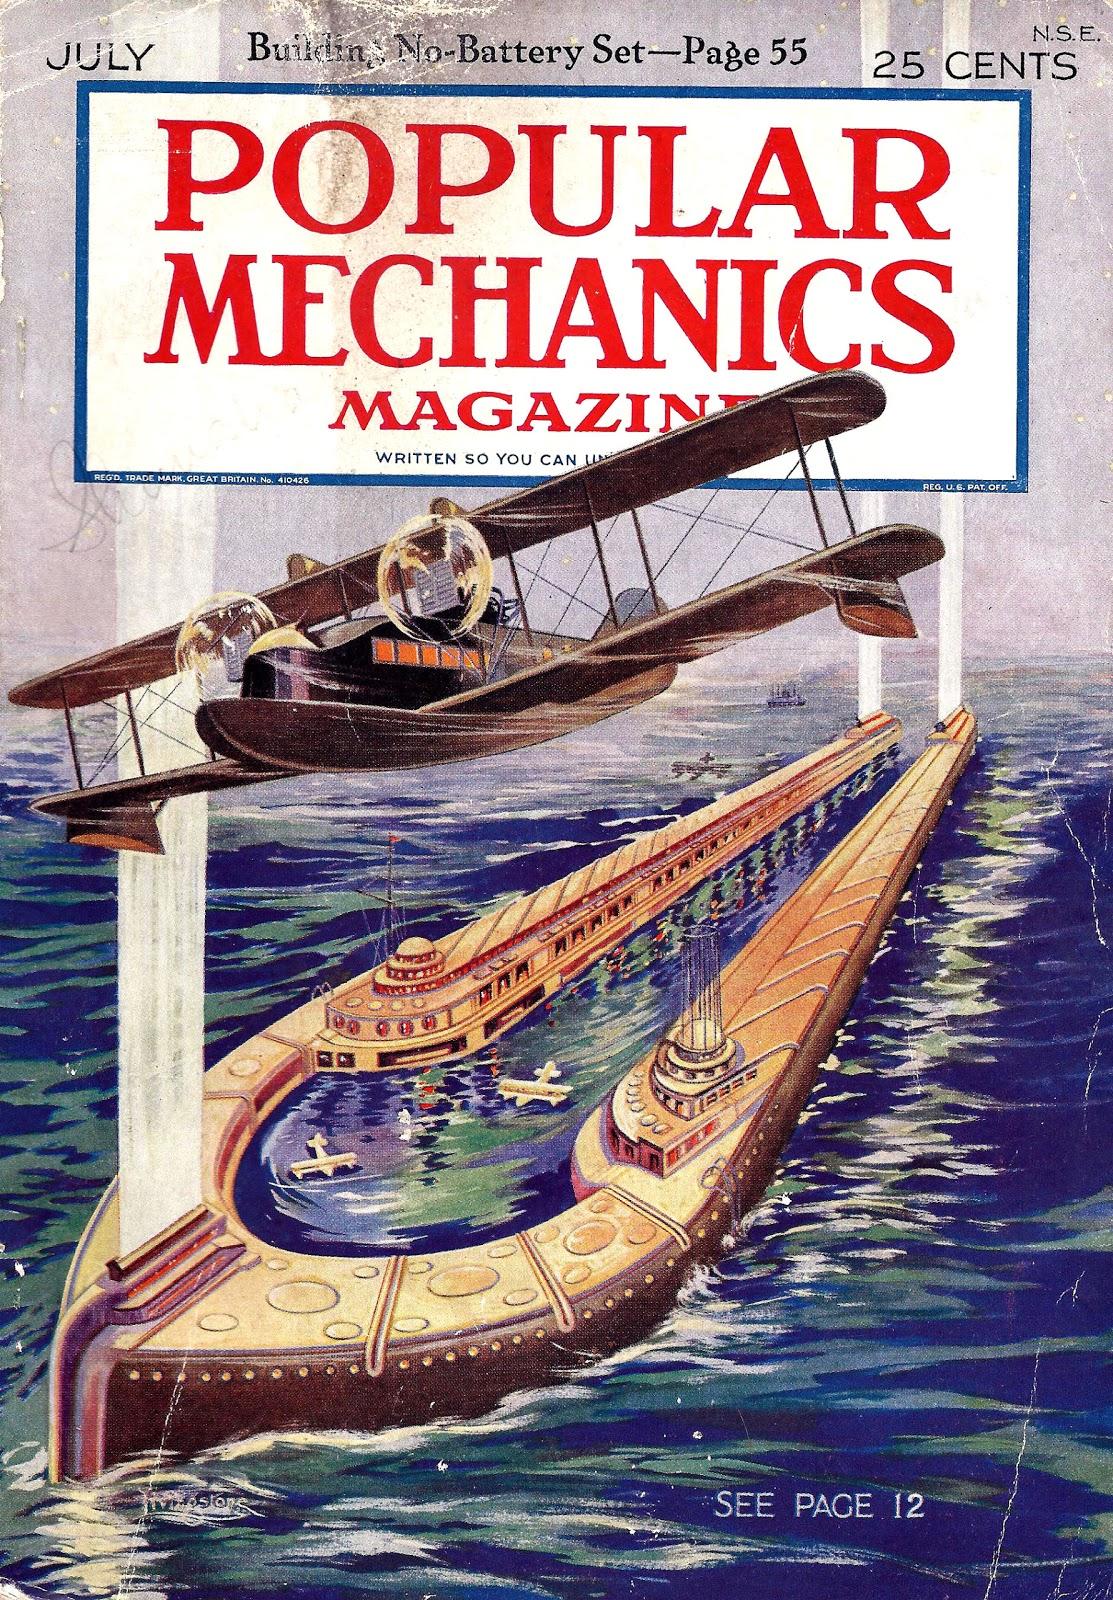 Popular Mechanics Magazine Reviews of the 1955 Luxury Cas